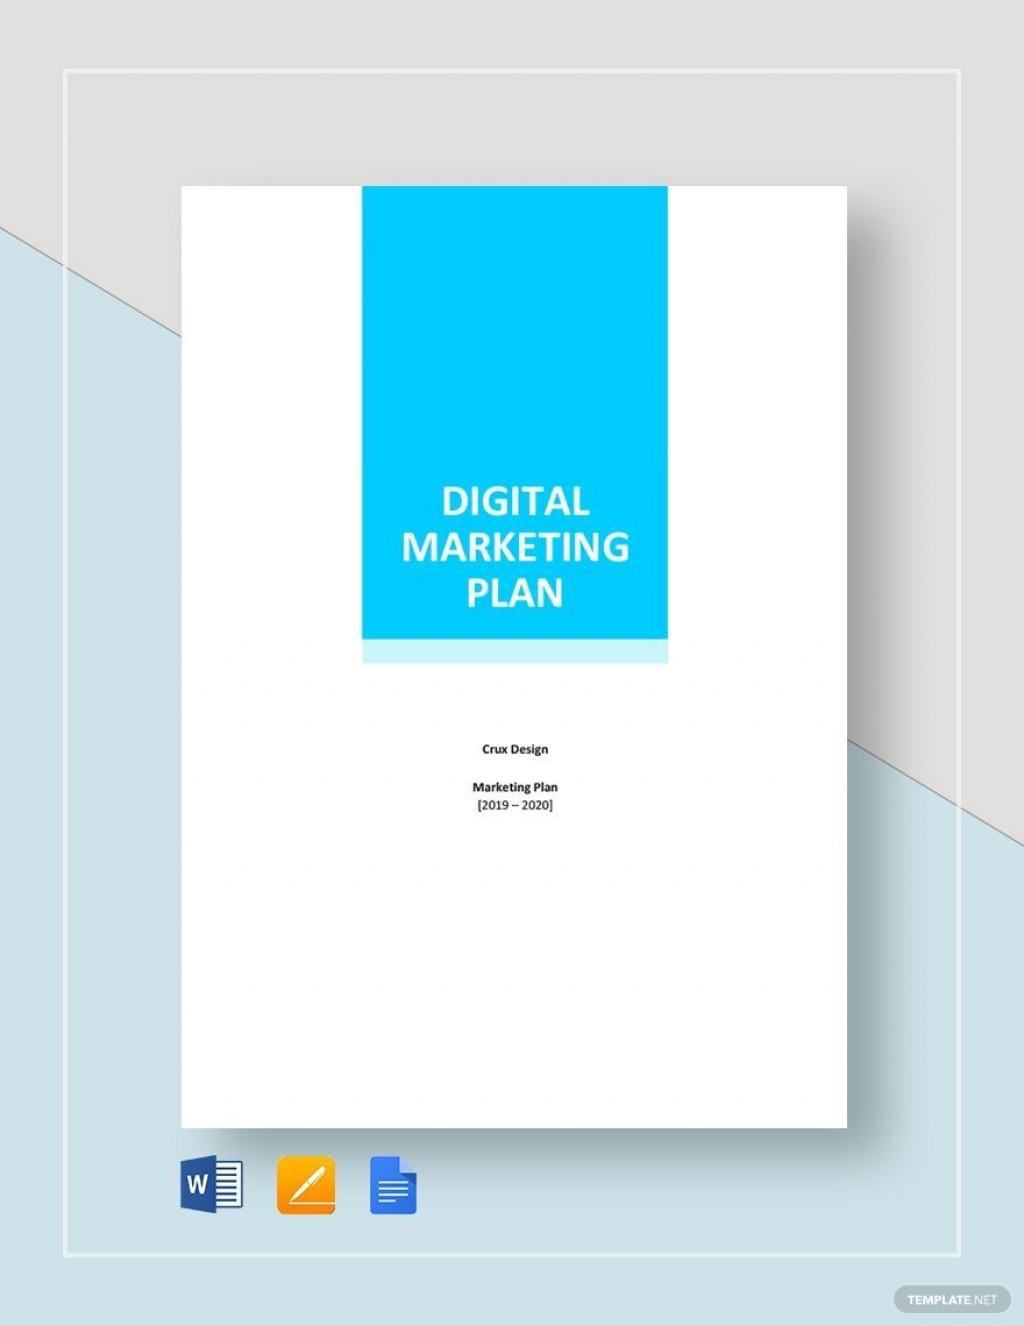 002 Stunning Marketing Plan Template Word Free Download Example Large